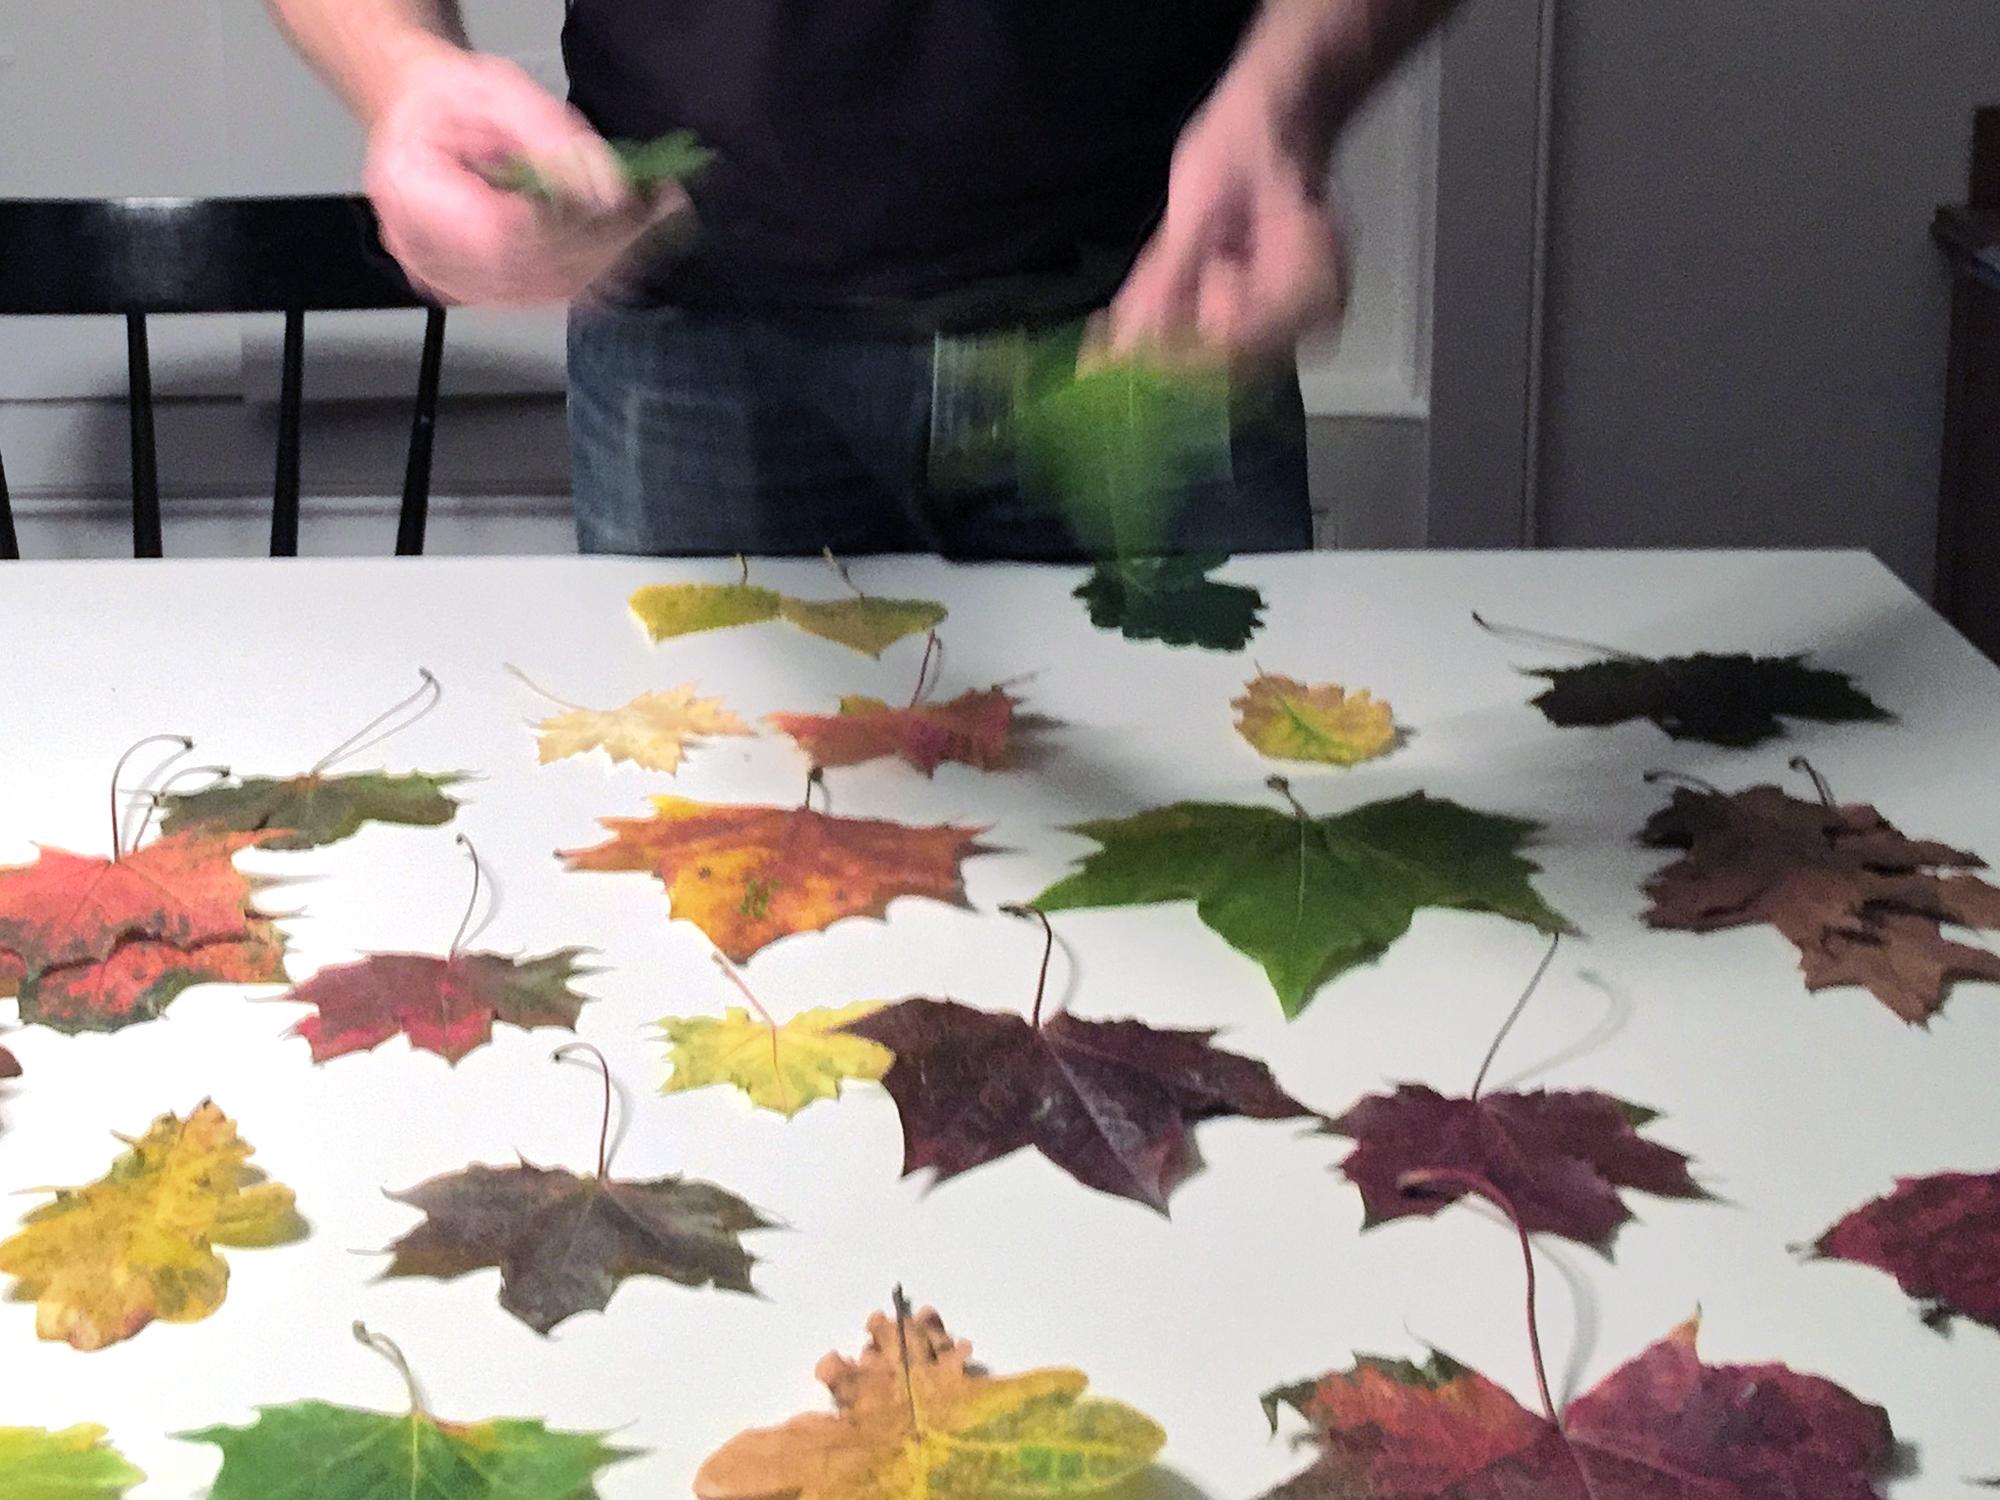 Picking the leaf